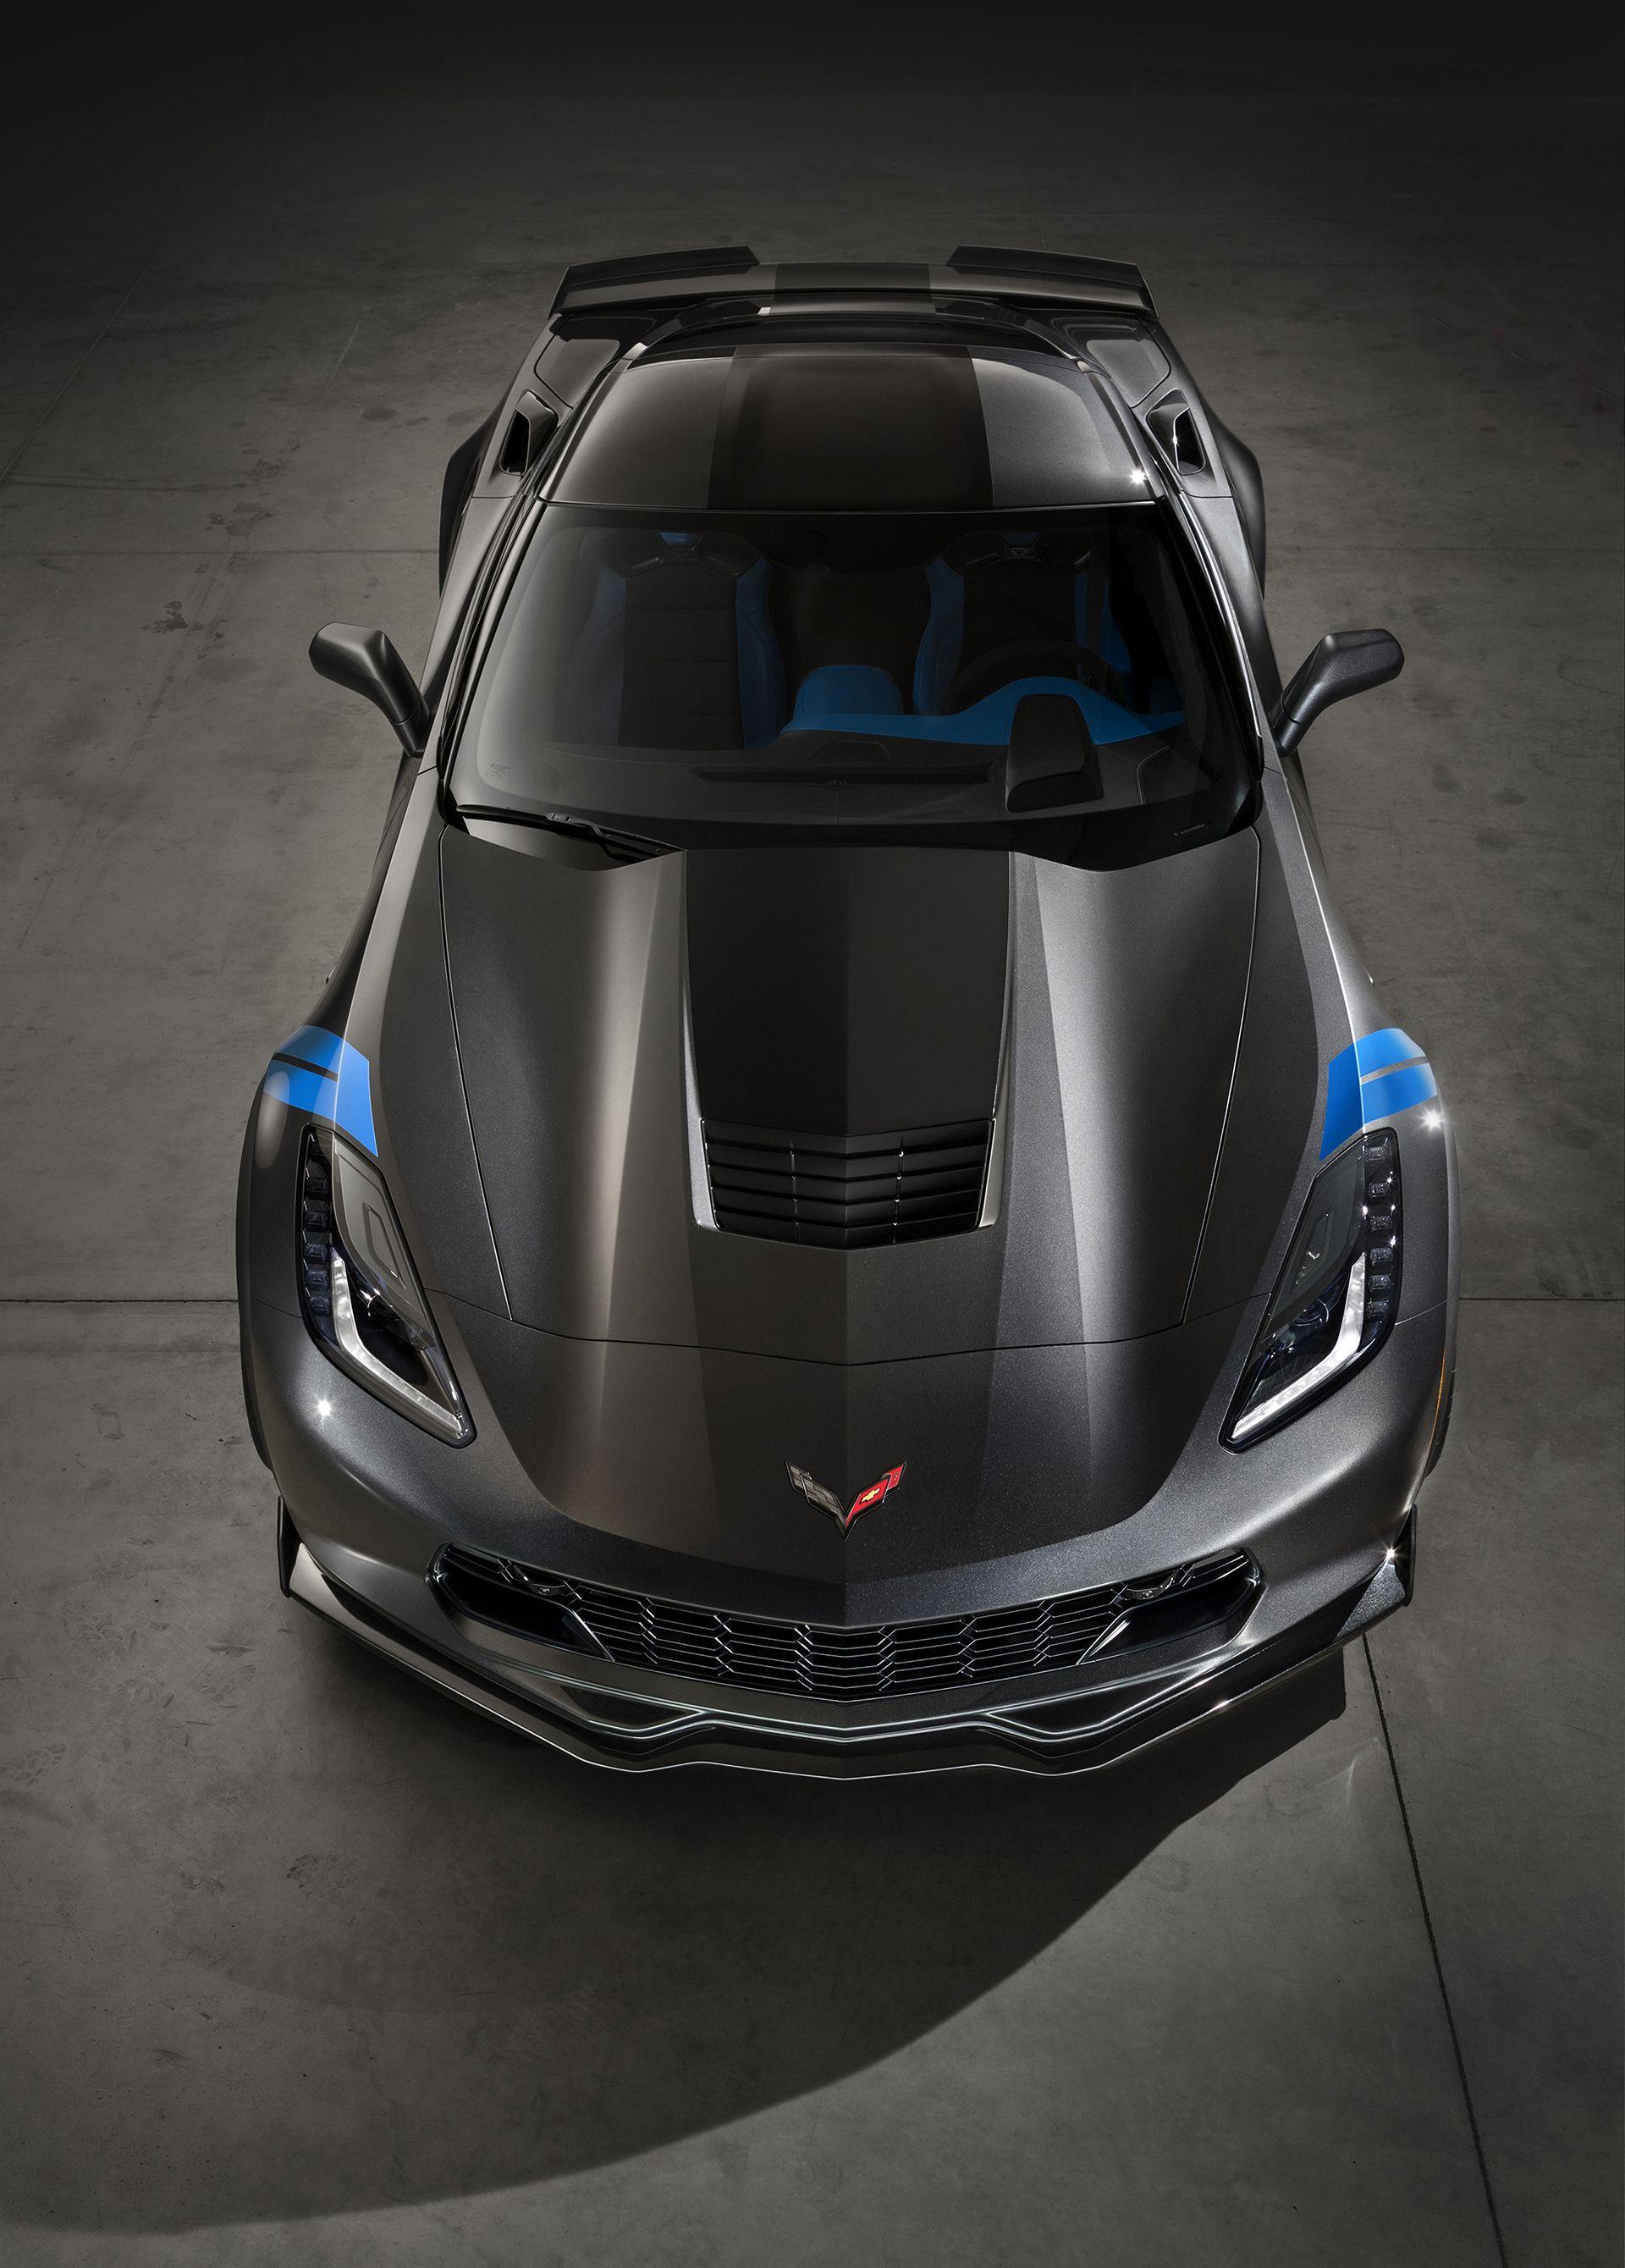 2017 corvette zora zr1 specs price autos concept - Find This Pin And More On Auto News By Carrrsauto 2017 Corvette